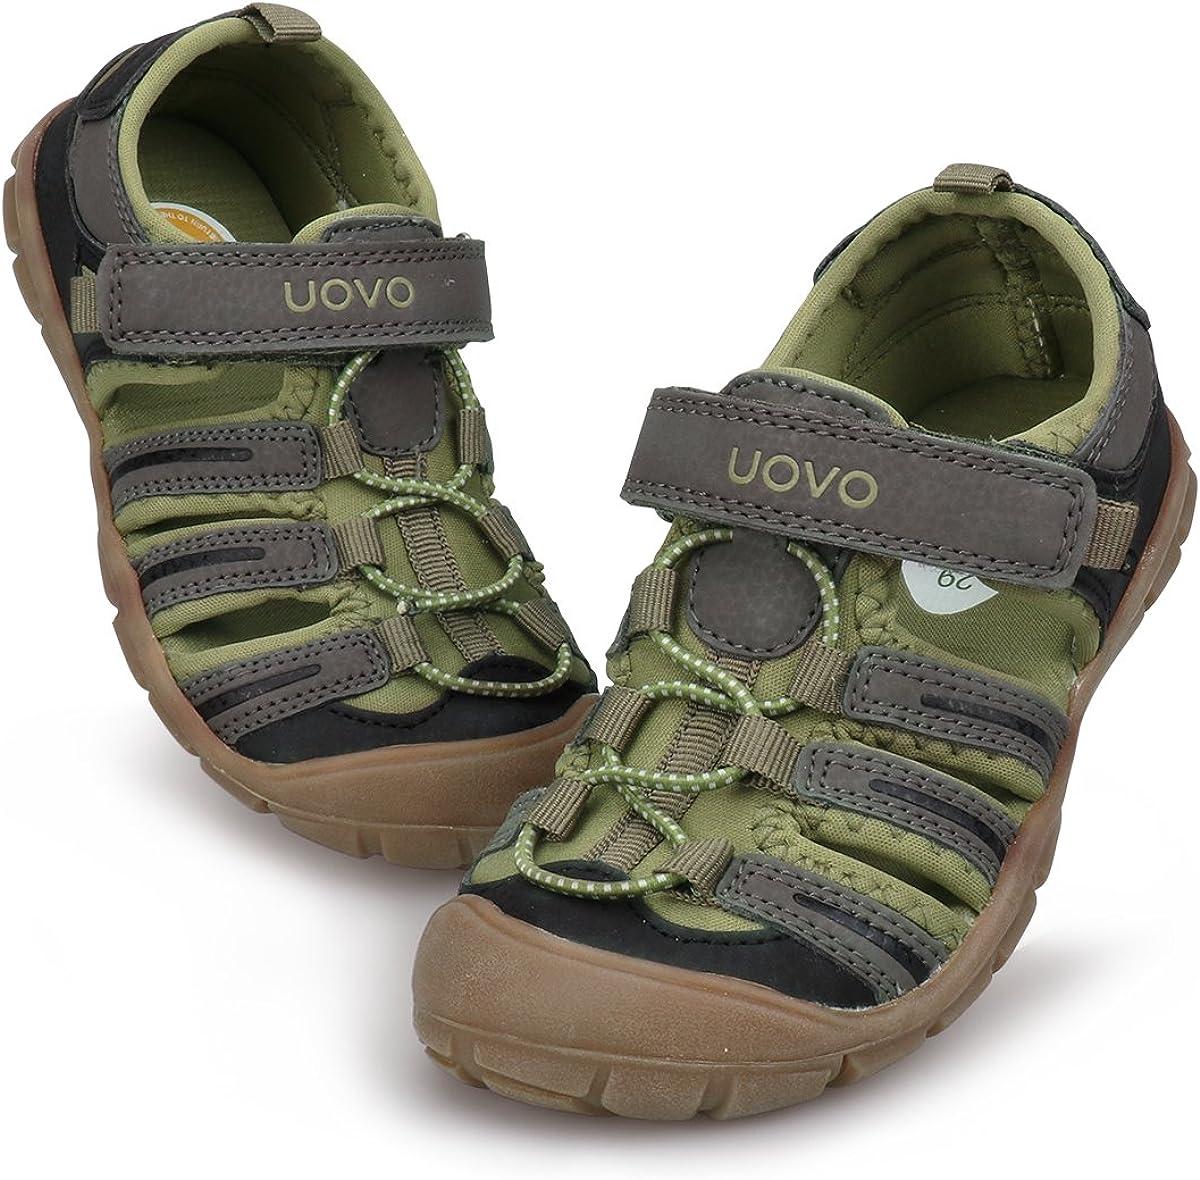 Boys Camouflage Sandals Summer Kids Beach Slip On Walking Shoes Childrens Size